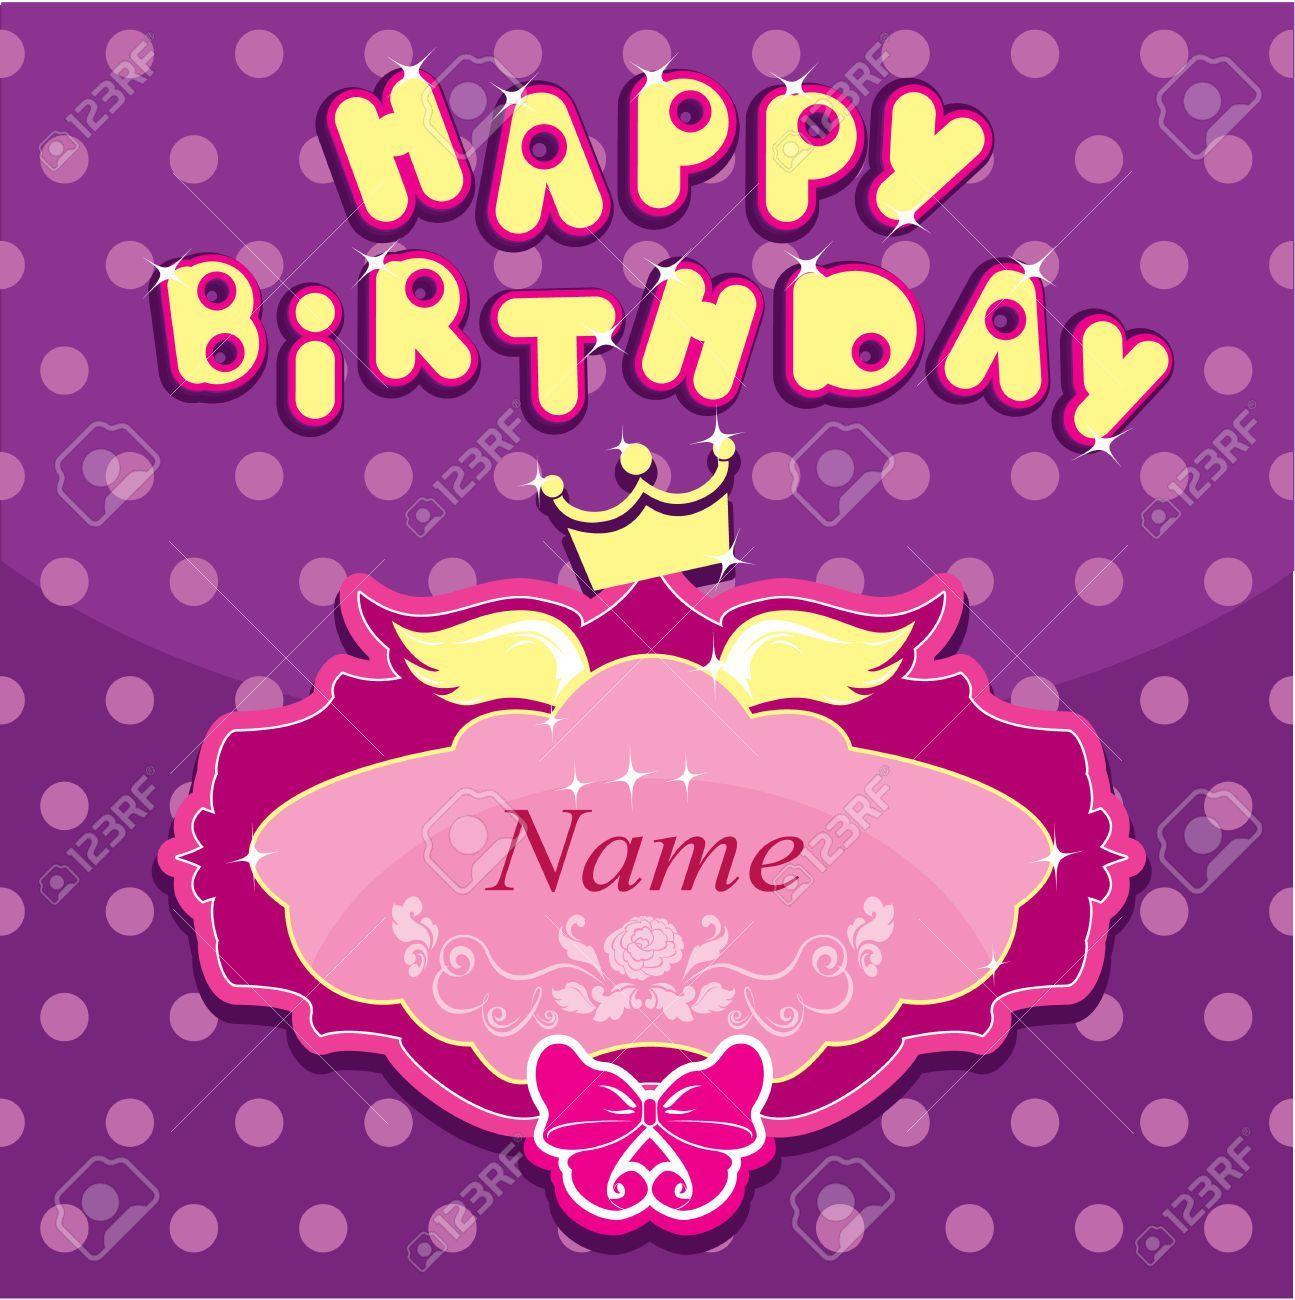 Carte anniversaire carte d invitation anniversaire fille carte carte anniversaire carte d invitation anniversaire fille carte anniversaire imprimier carte anniversaire imprimier carte anniversaire pinterest stopboris Choice Image